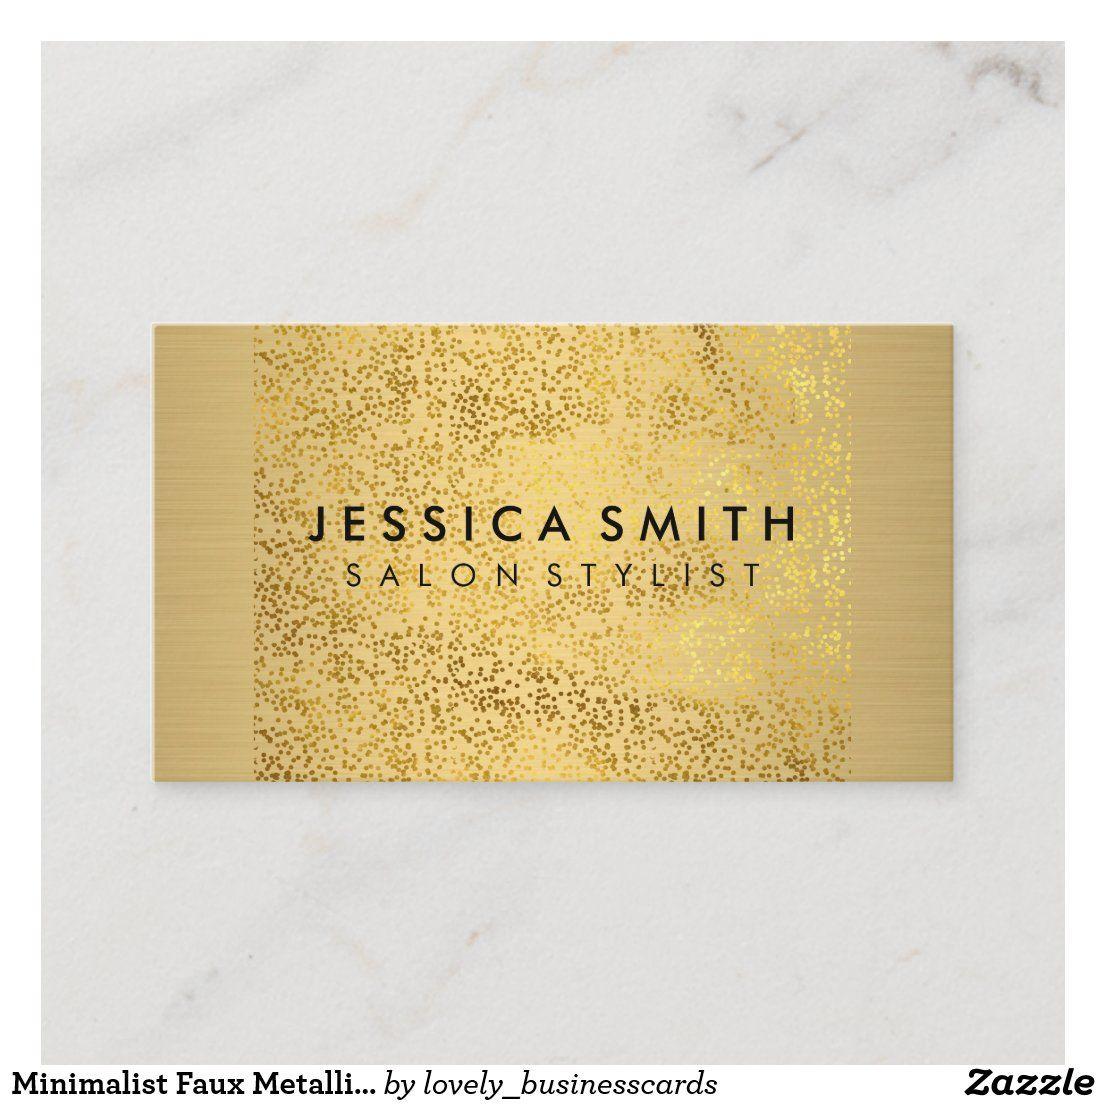 Minimalist Faux Metallic Gold Flakes Pattern Business Card Zazzle Com Business Card Pattern Hairstylist Business Cards Stylist Business Cards